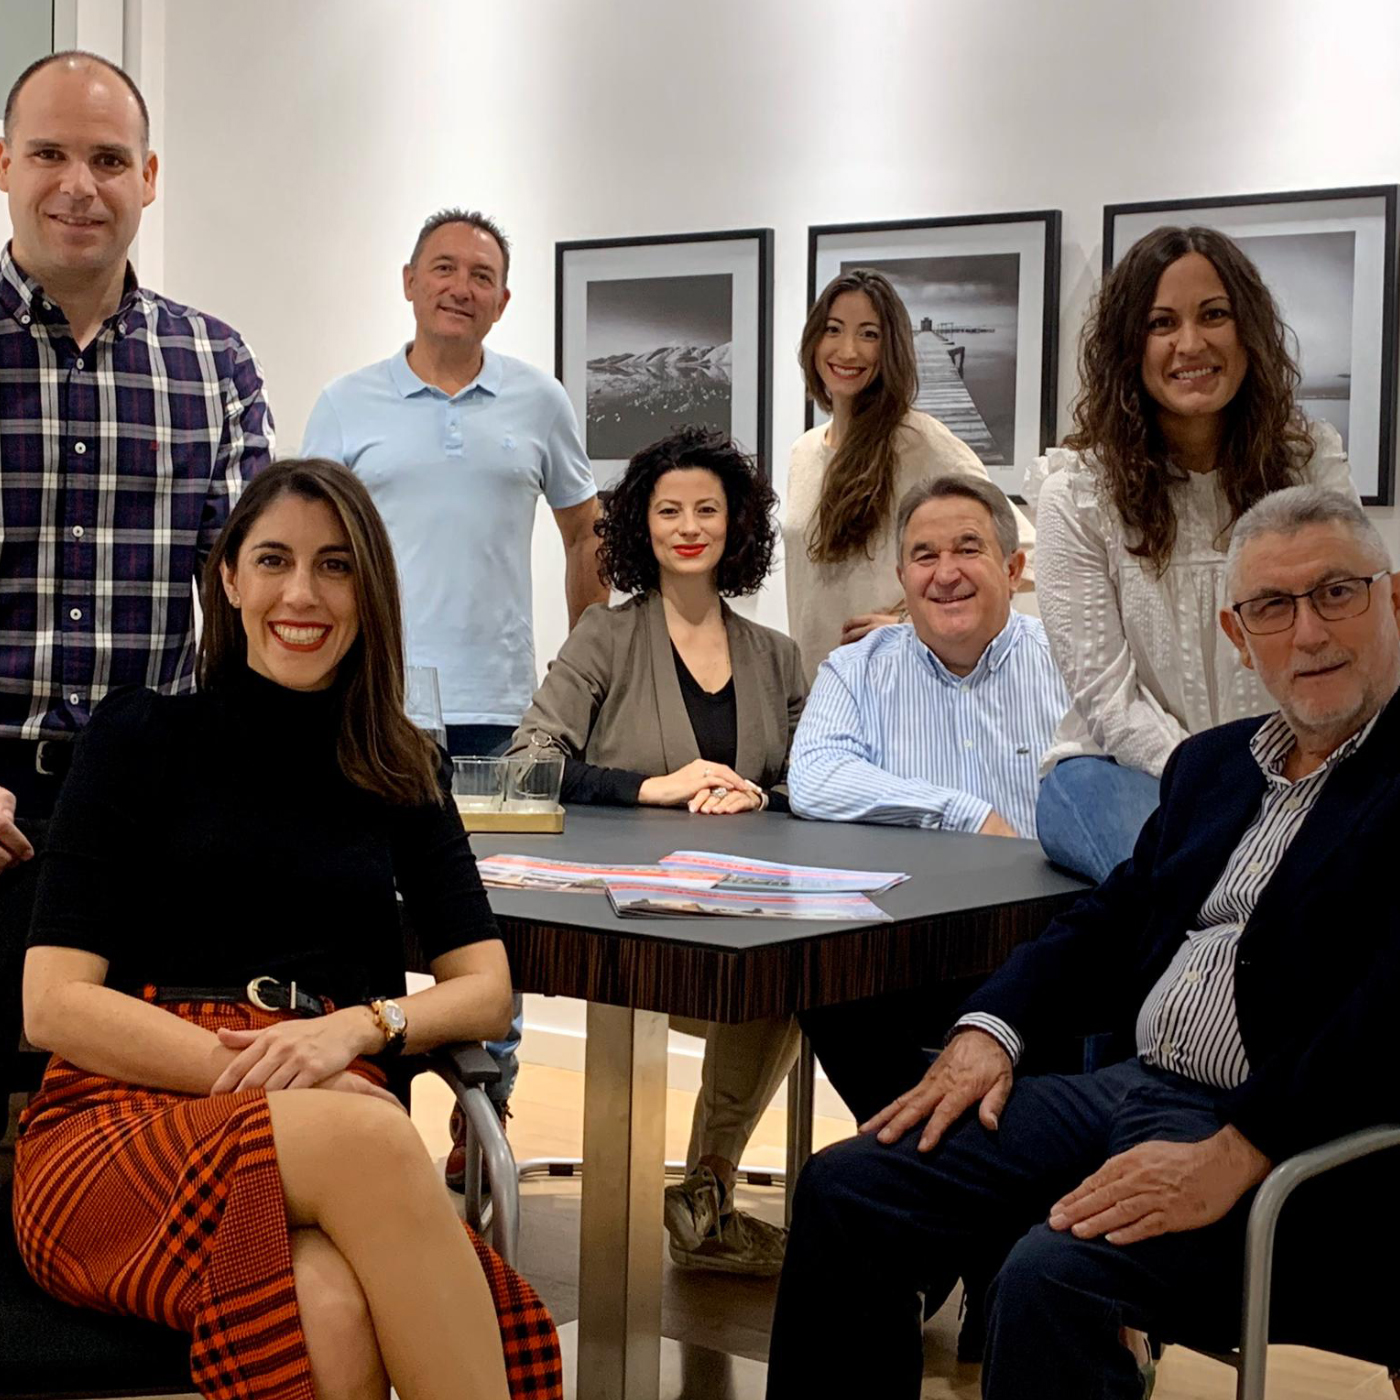 https://okeyviviendas.com/wp-content/uploads/2020/08/Equipo-Okey-Viviendas-Promotora.jpg